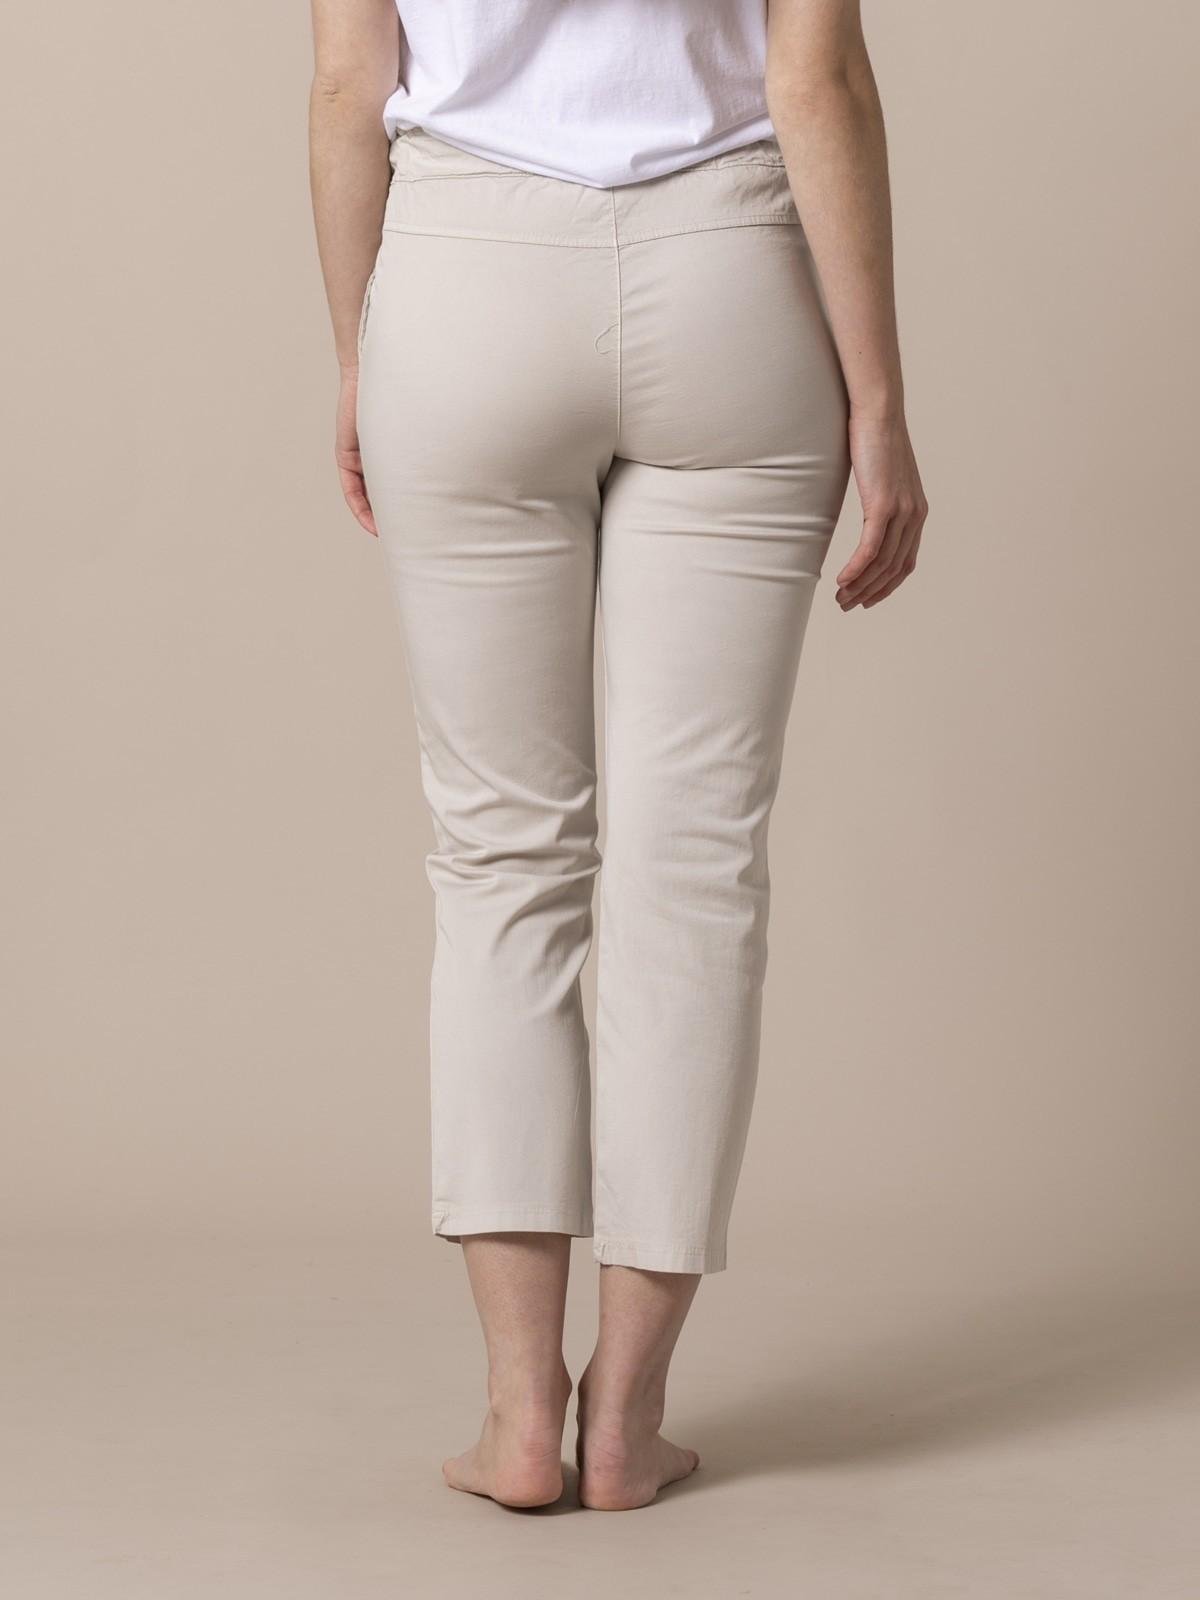 Pantalón mujer tobillero casual Beige